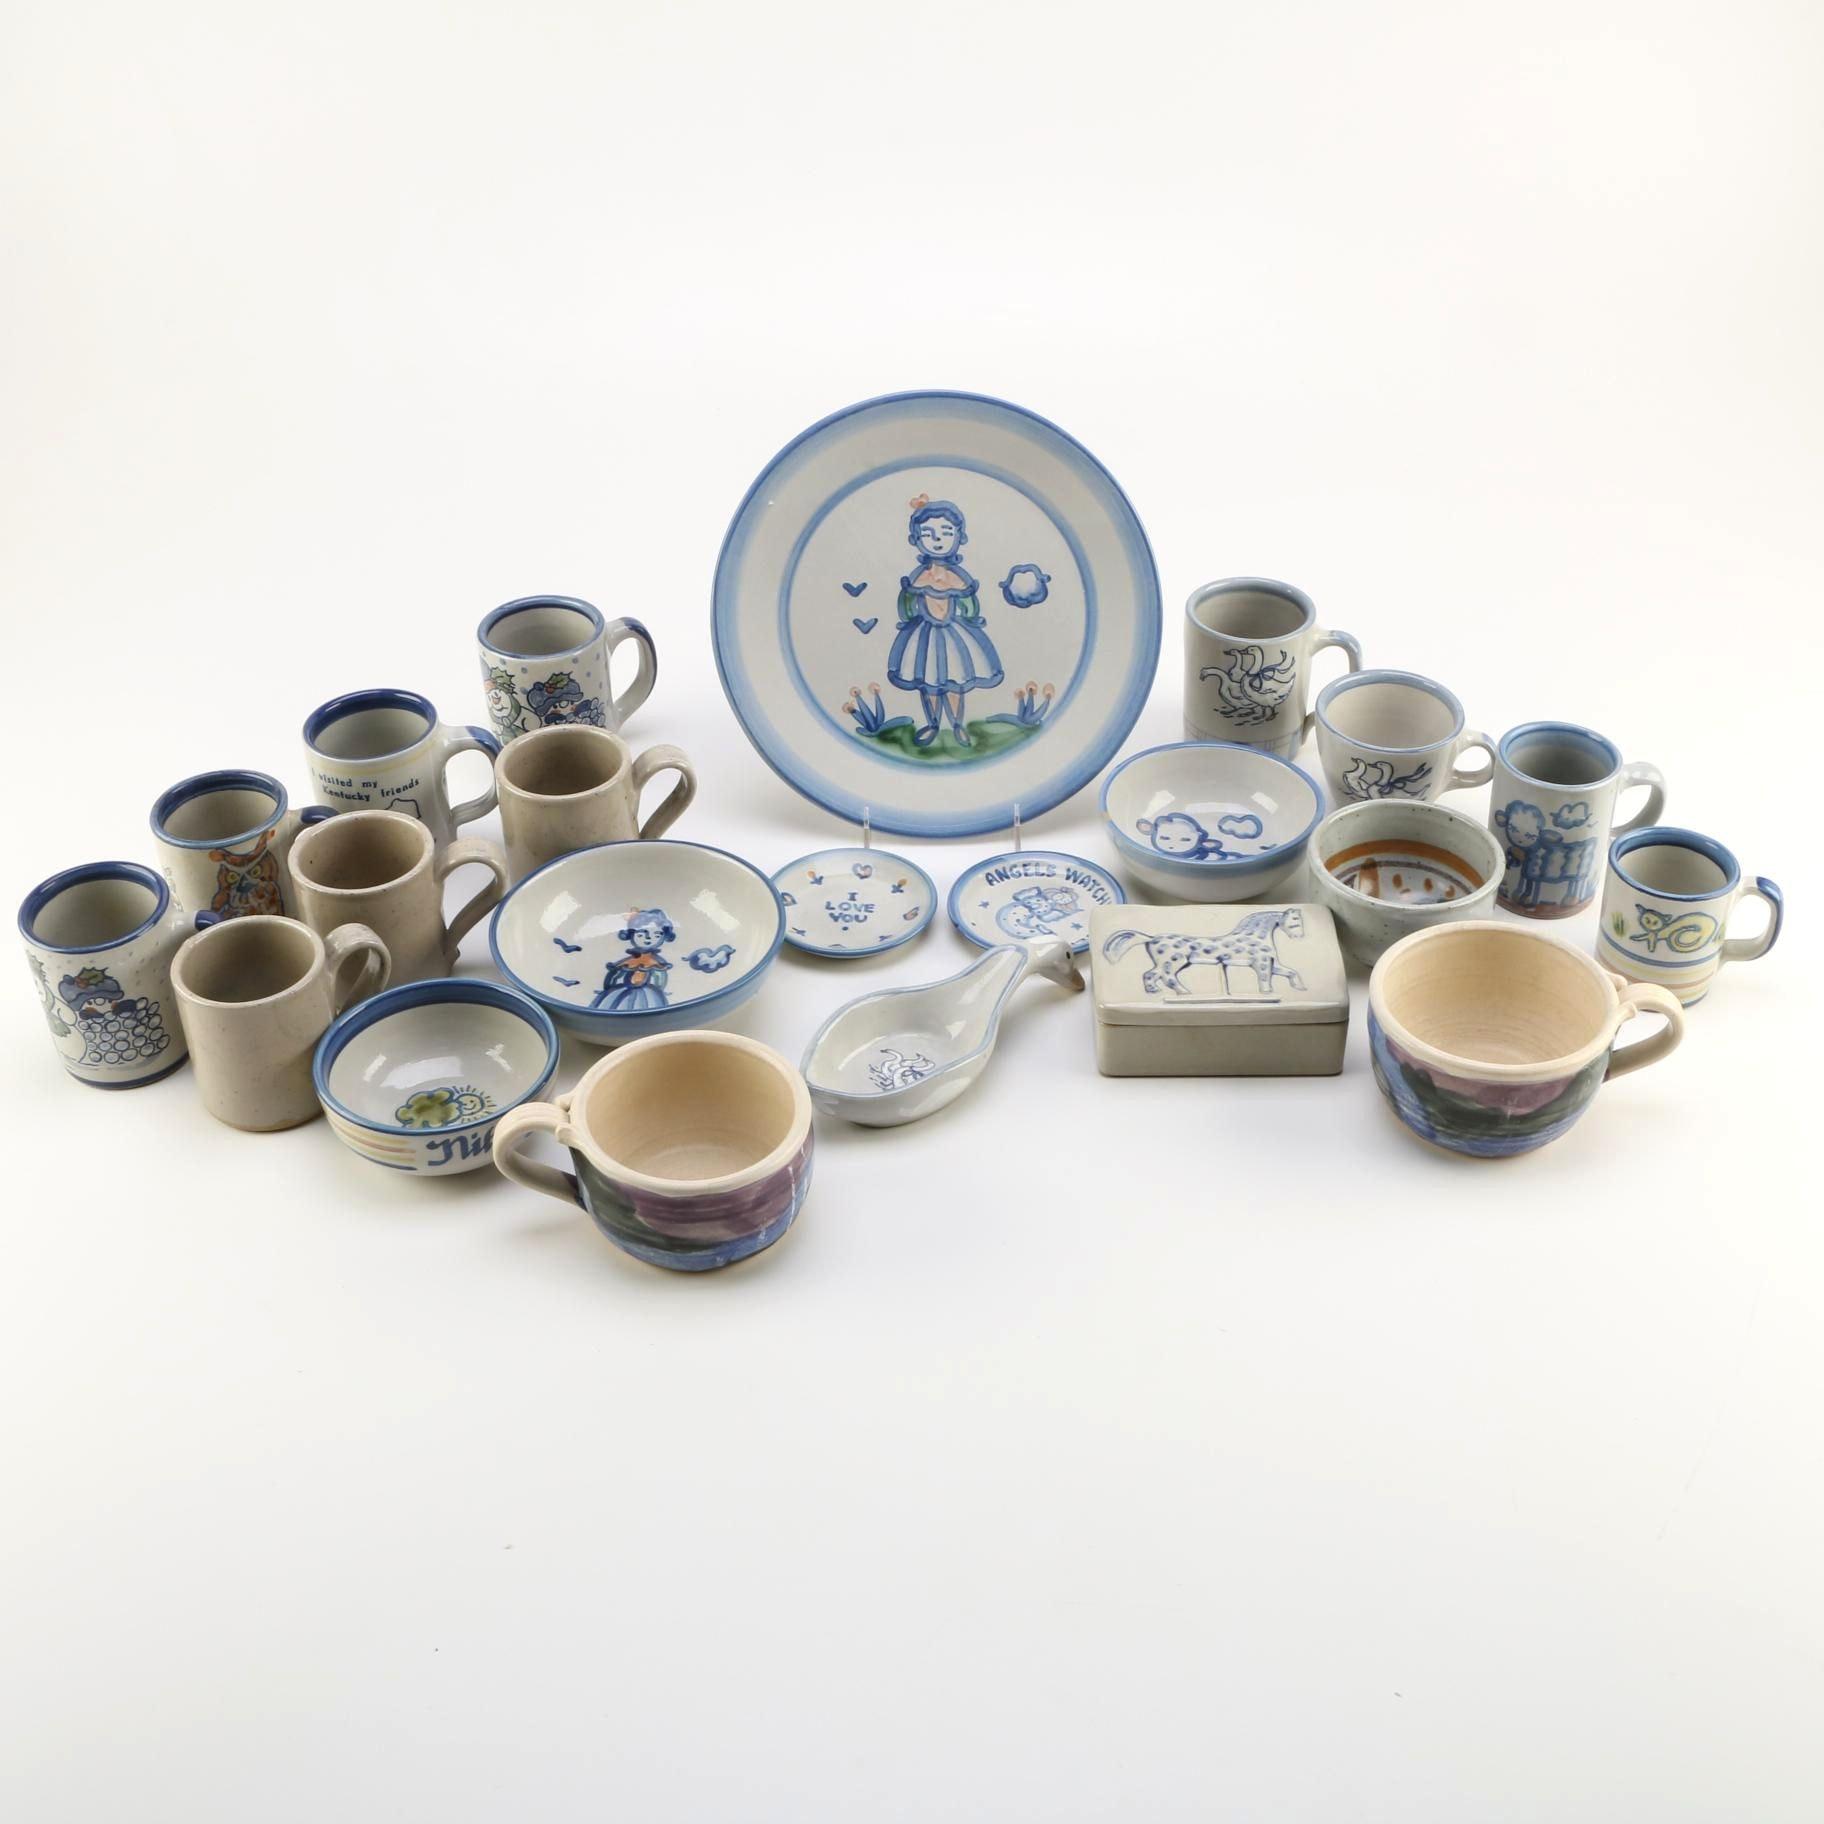 M. A. Hadley Louisville Stoneware Ceramic Mug and Dish Assortment